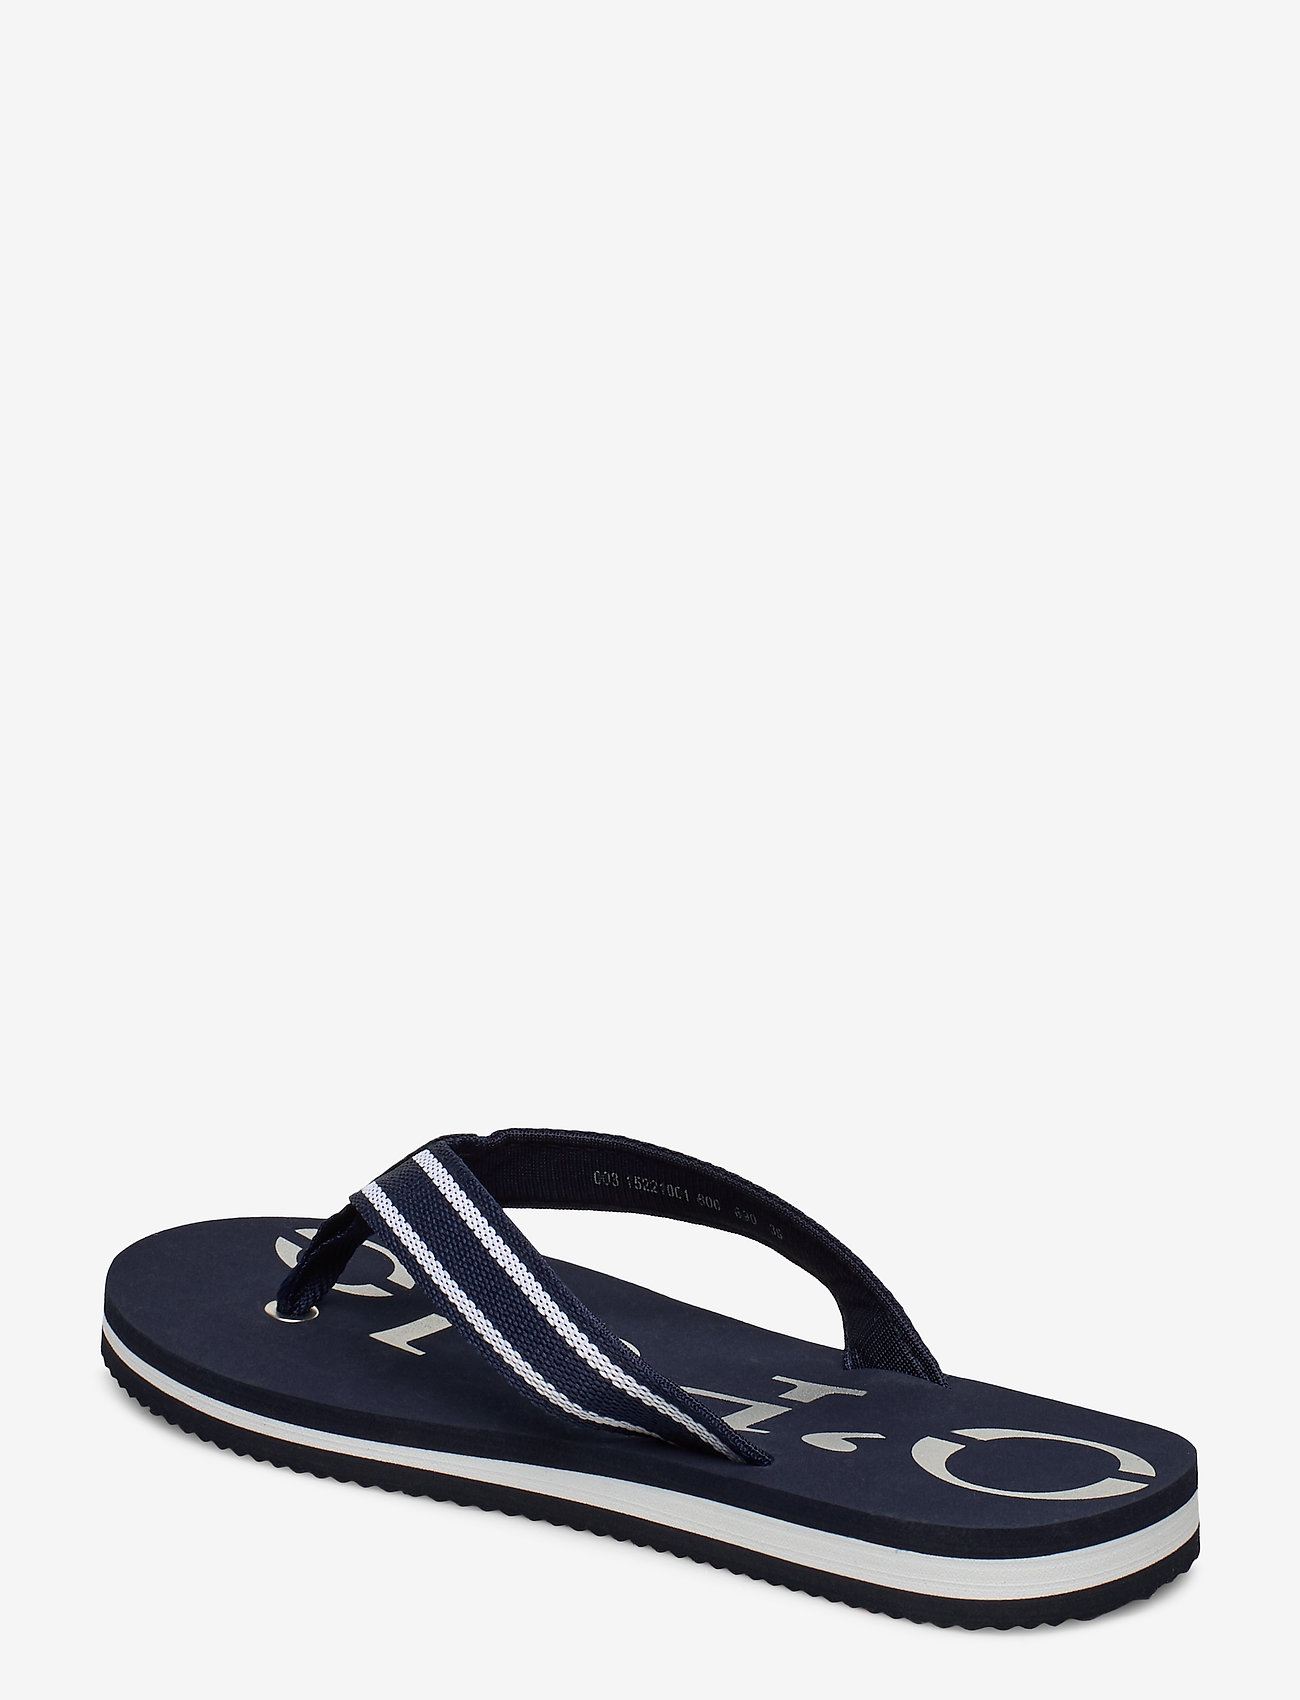 Clara 1 (Navy) - Marc O'Polo Footwear